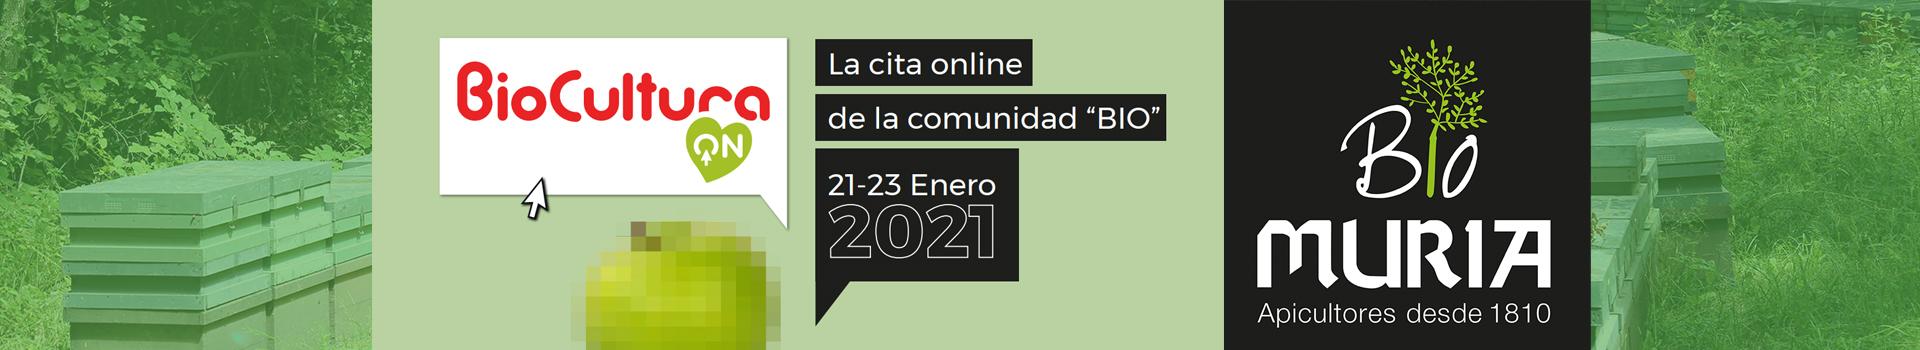 BANNER-BIOCULTURA-2021